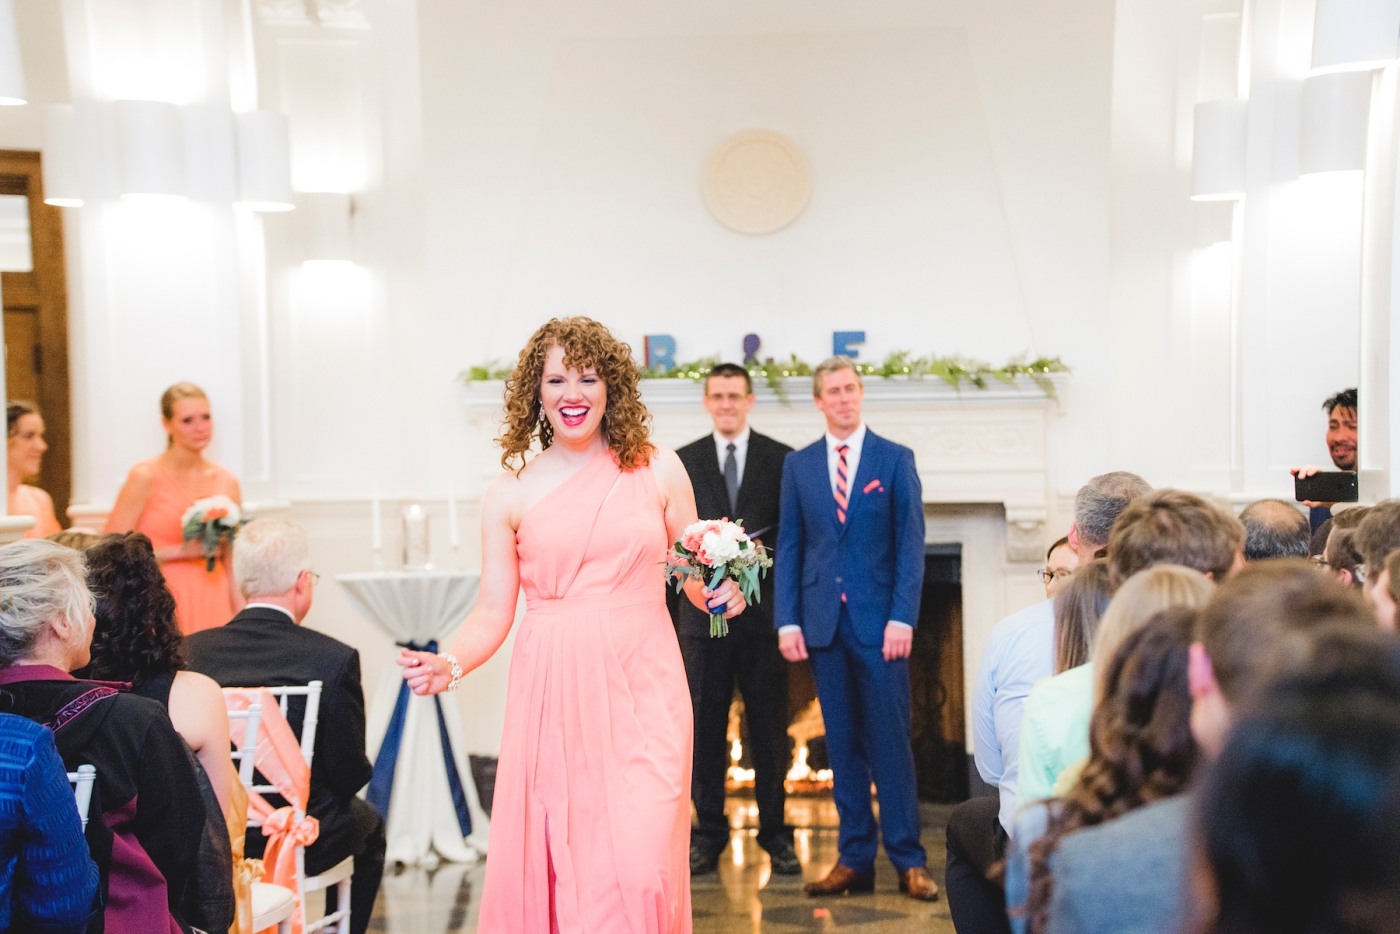 DSC_2741Everett_Wedding_Ballroom_Jane_Speleers_photography_Rachel_and_Edmund_Ceremony_2017